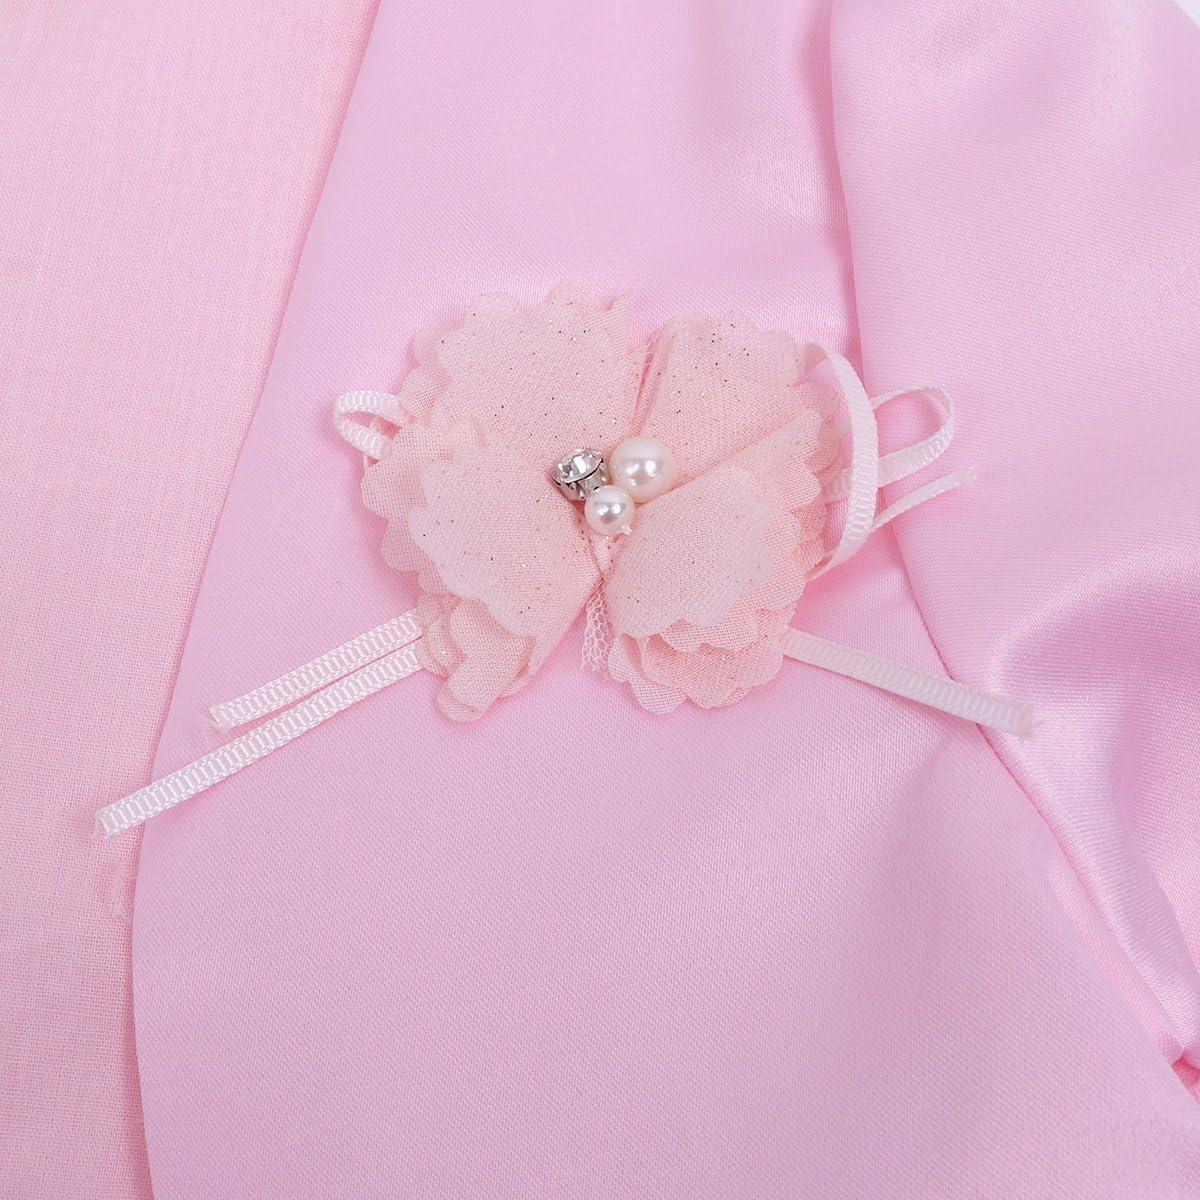 JanJean Kids Girls Long Sleeve Bolero Jacket Shrug Short Cardigan Dress Cover up Outerwear